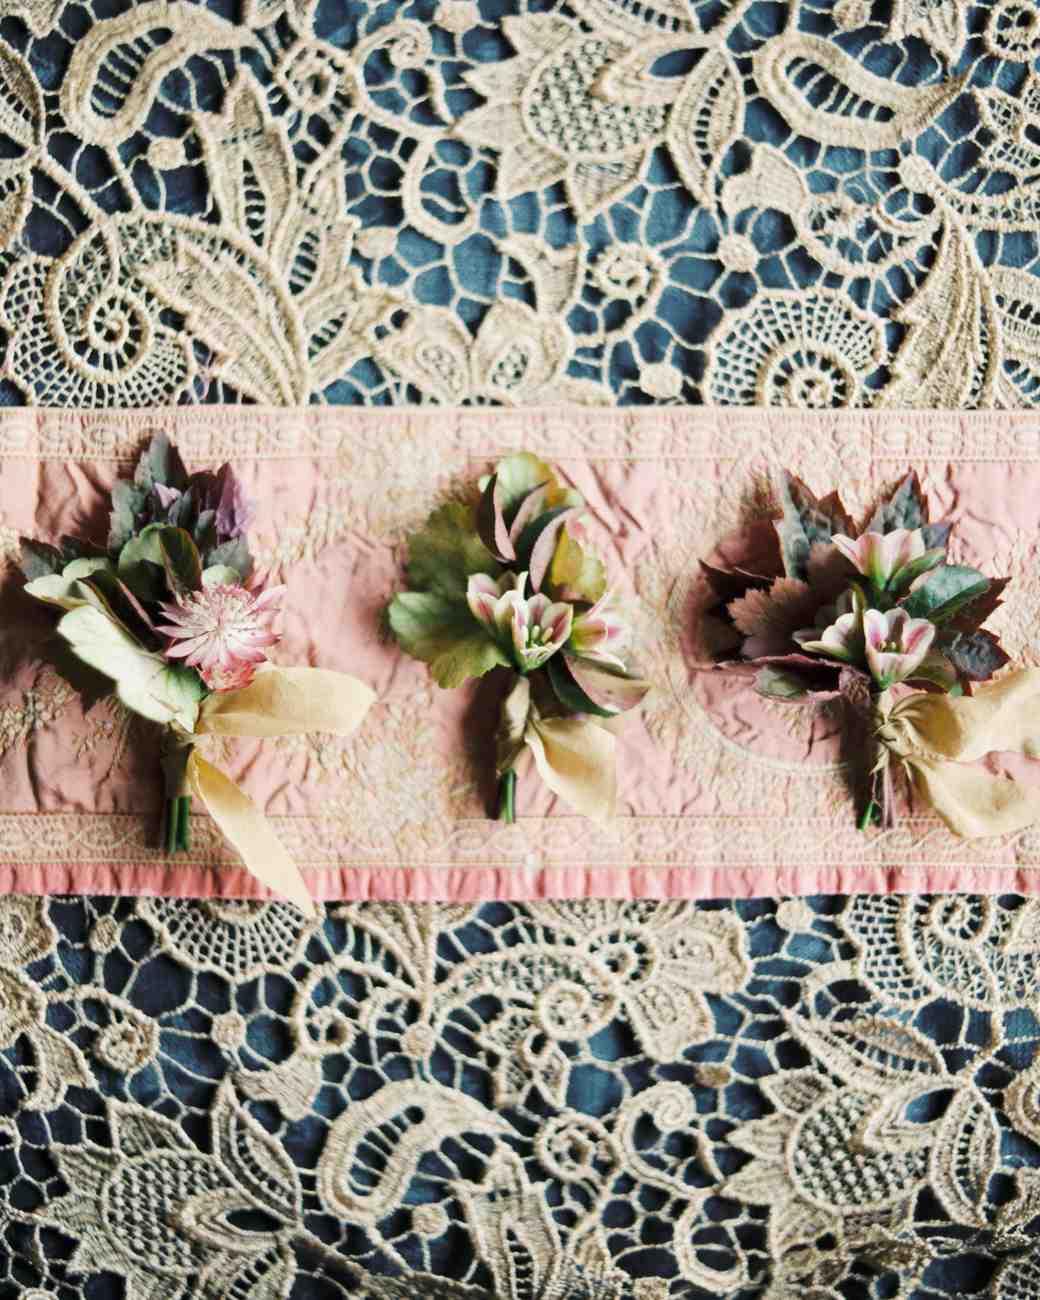 ginny-andrew-wedding-boutonnieres-0046-s112676-0216.jpg